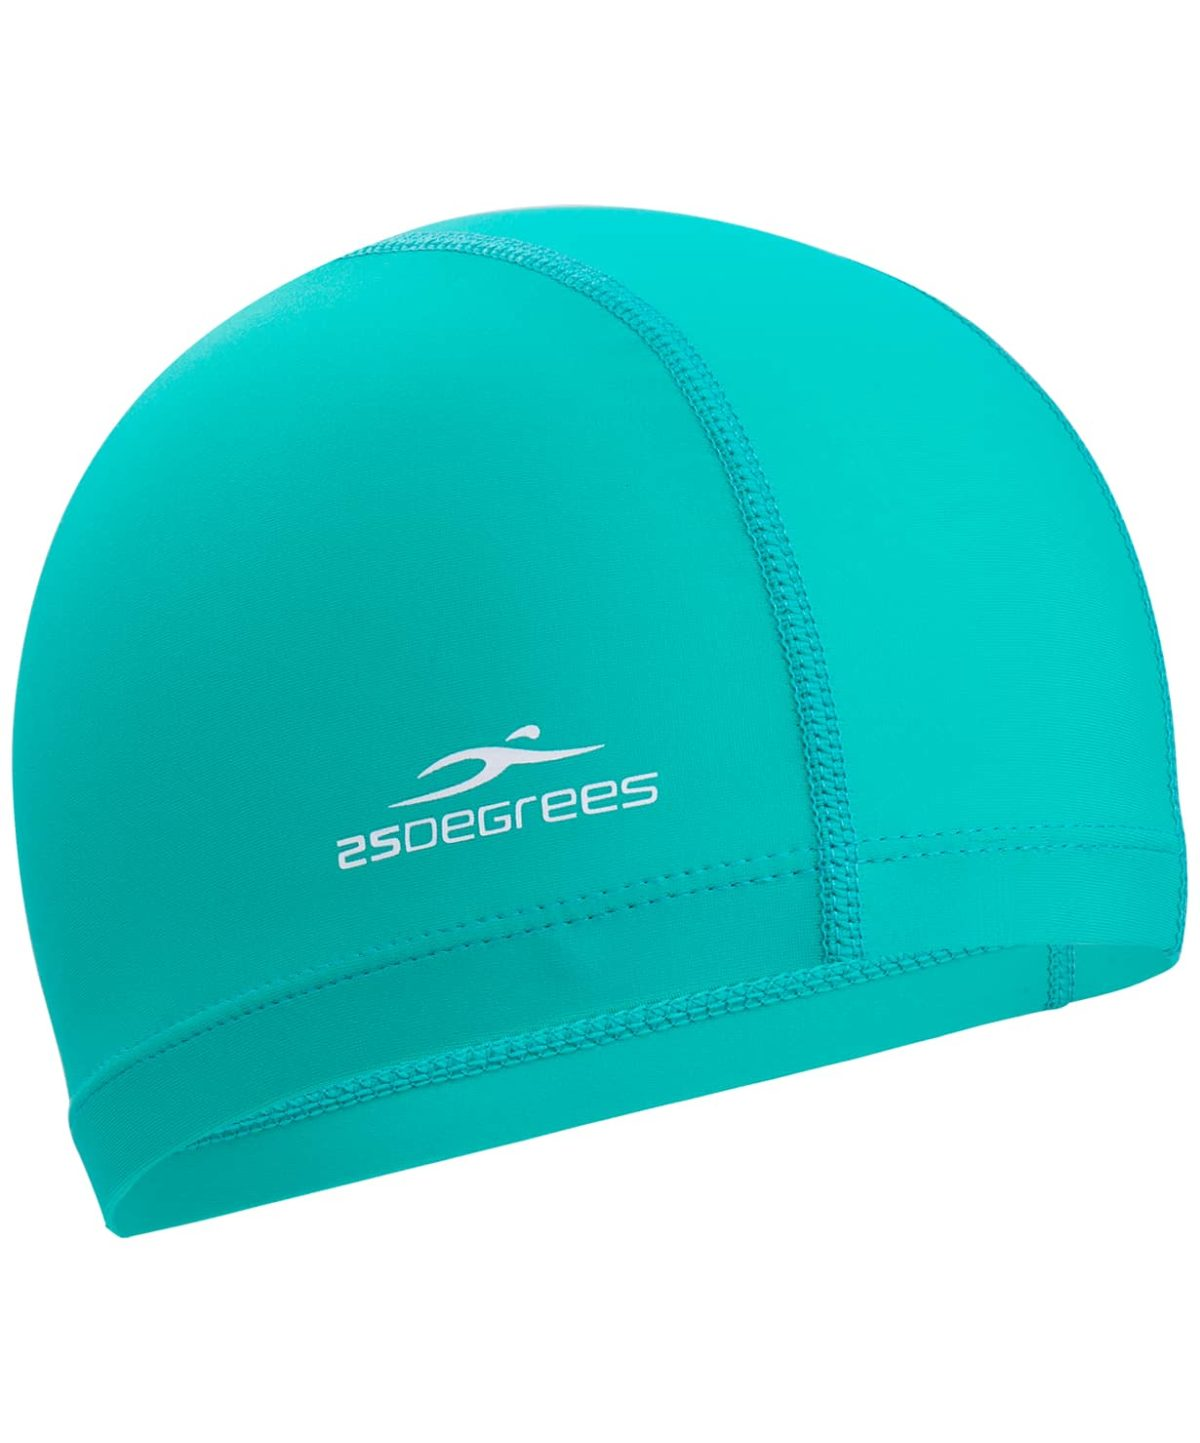 25DEGREES Шапочка для плавания Essence, дет. полиамид  25D21002K: аквамарин - 2